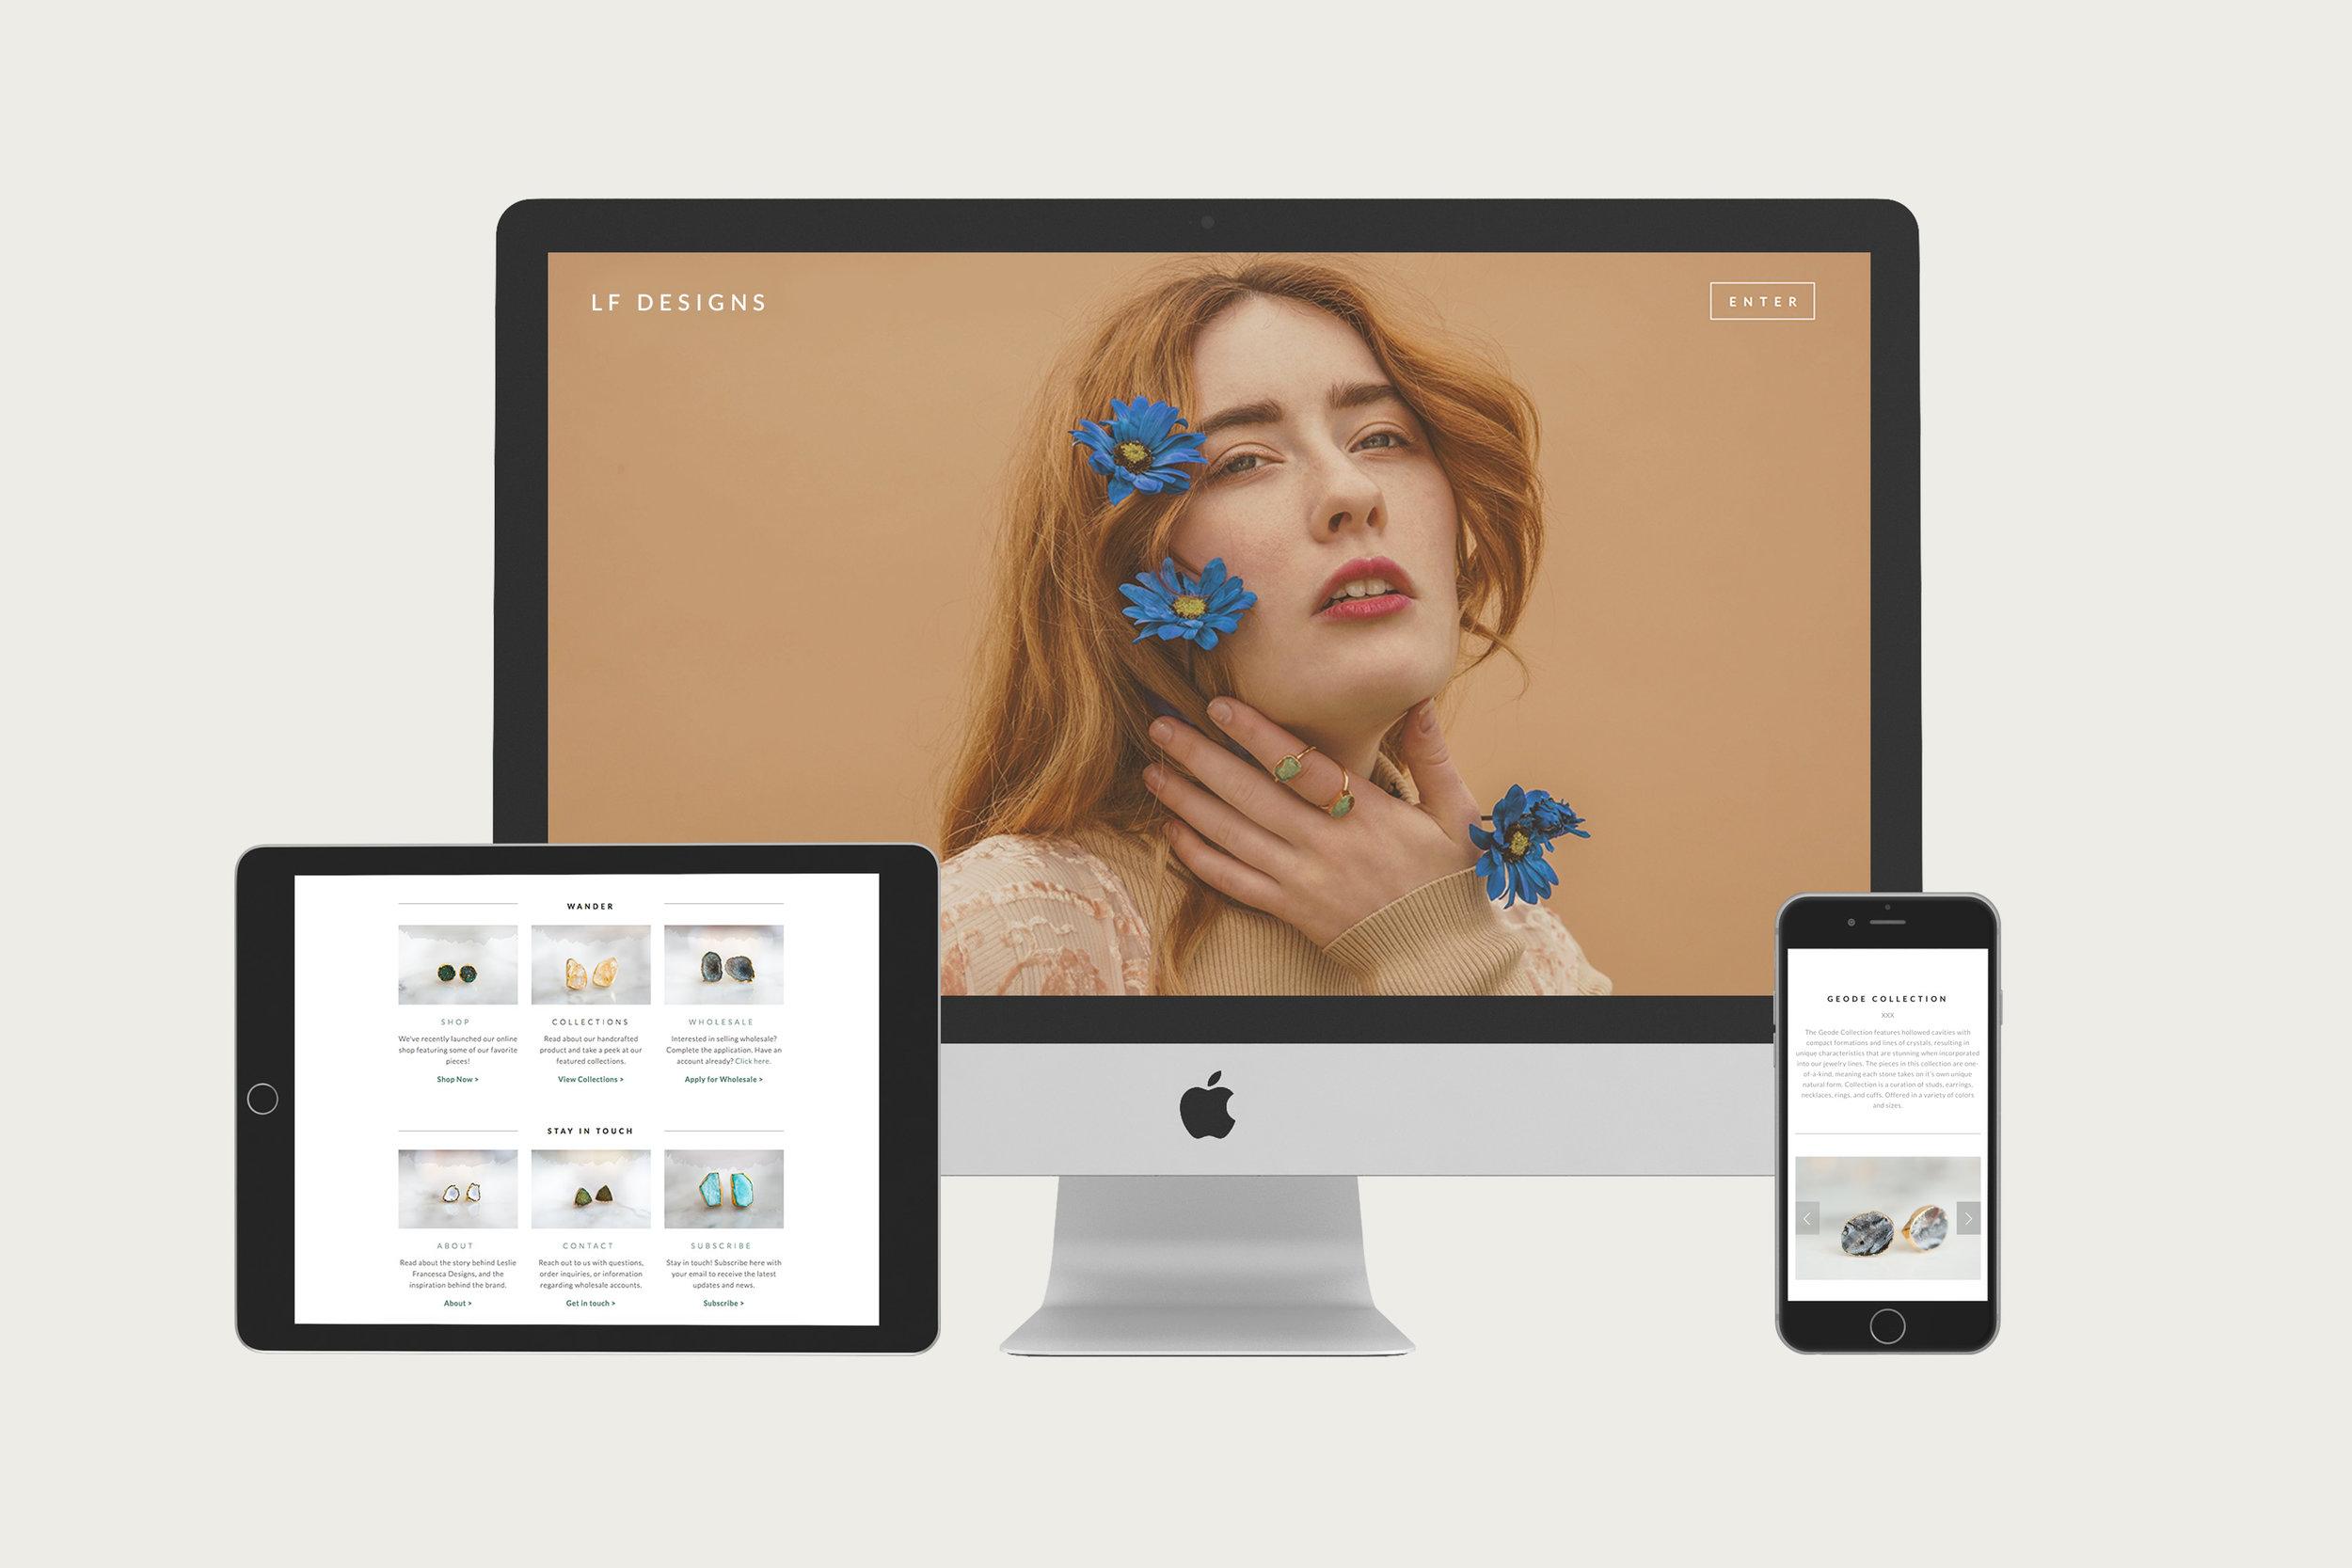 LF_webdesign.jpg